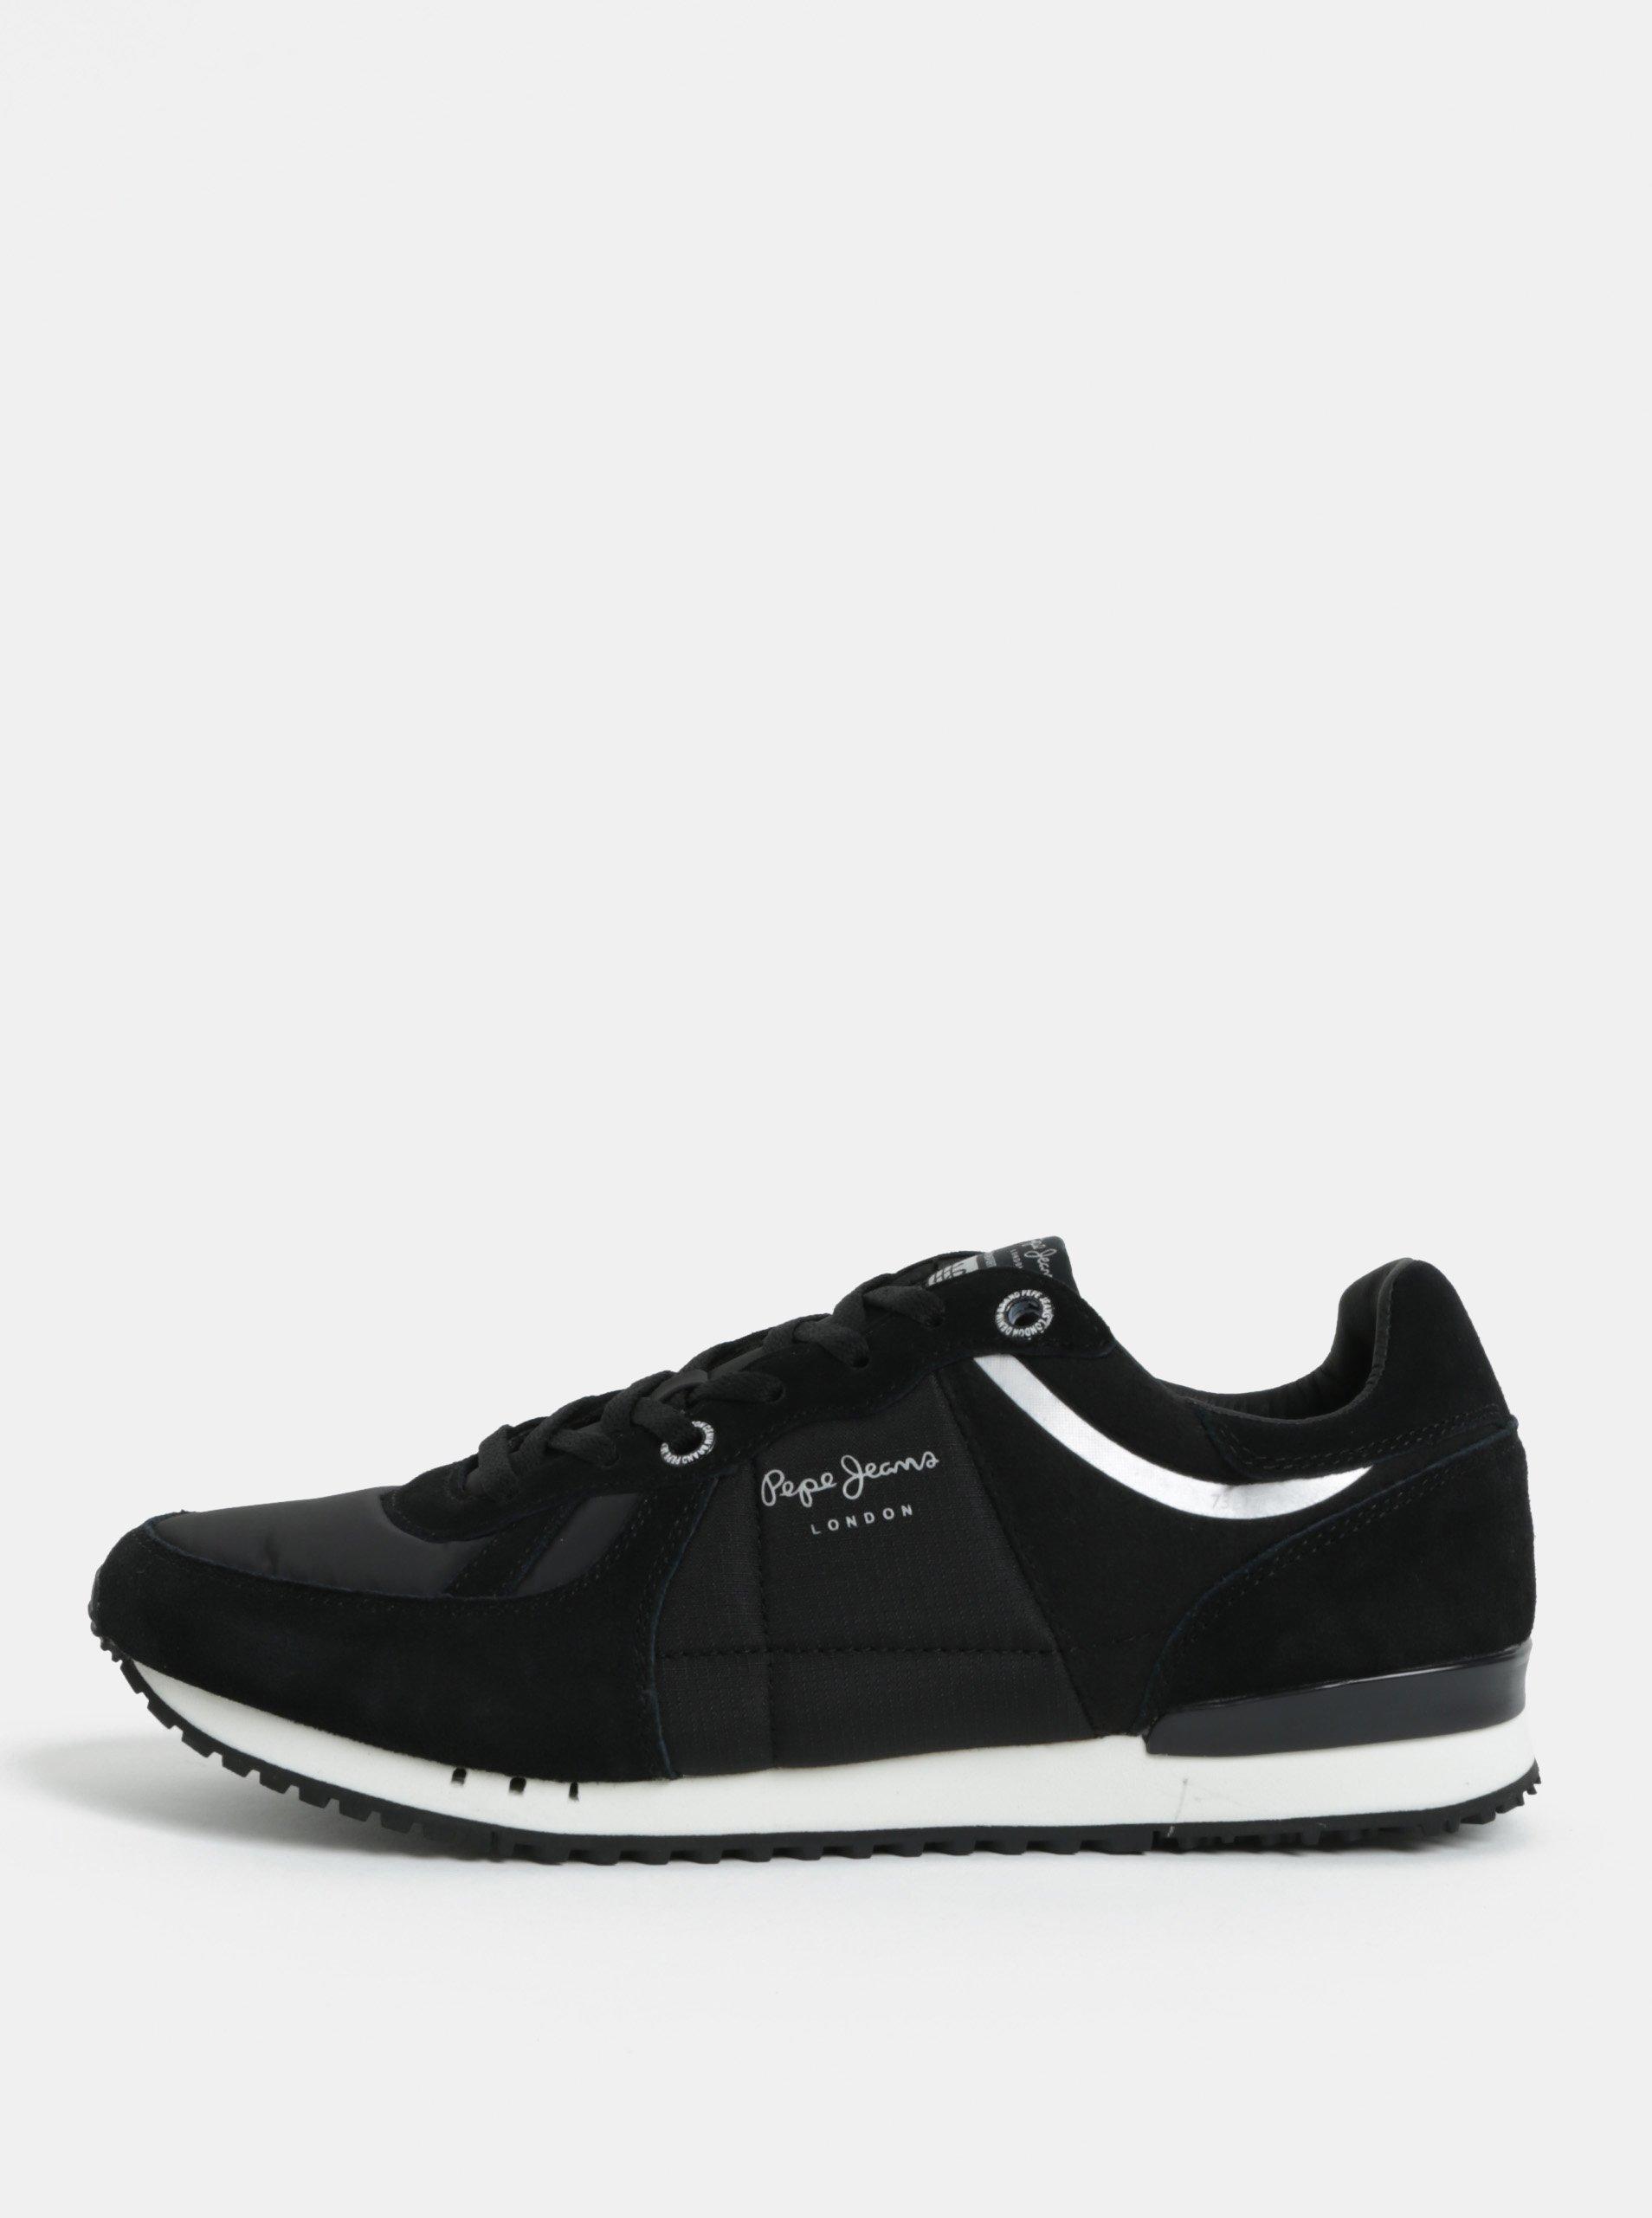 5e4acdf740 Čierne pánske semišové tenisky Pepe Jeans Tinker